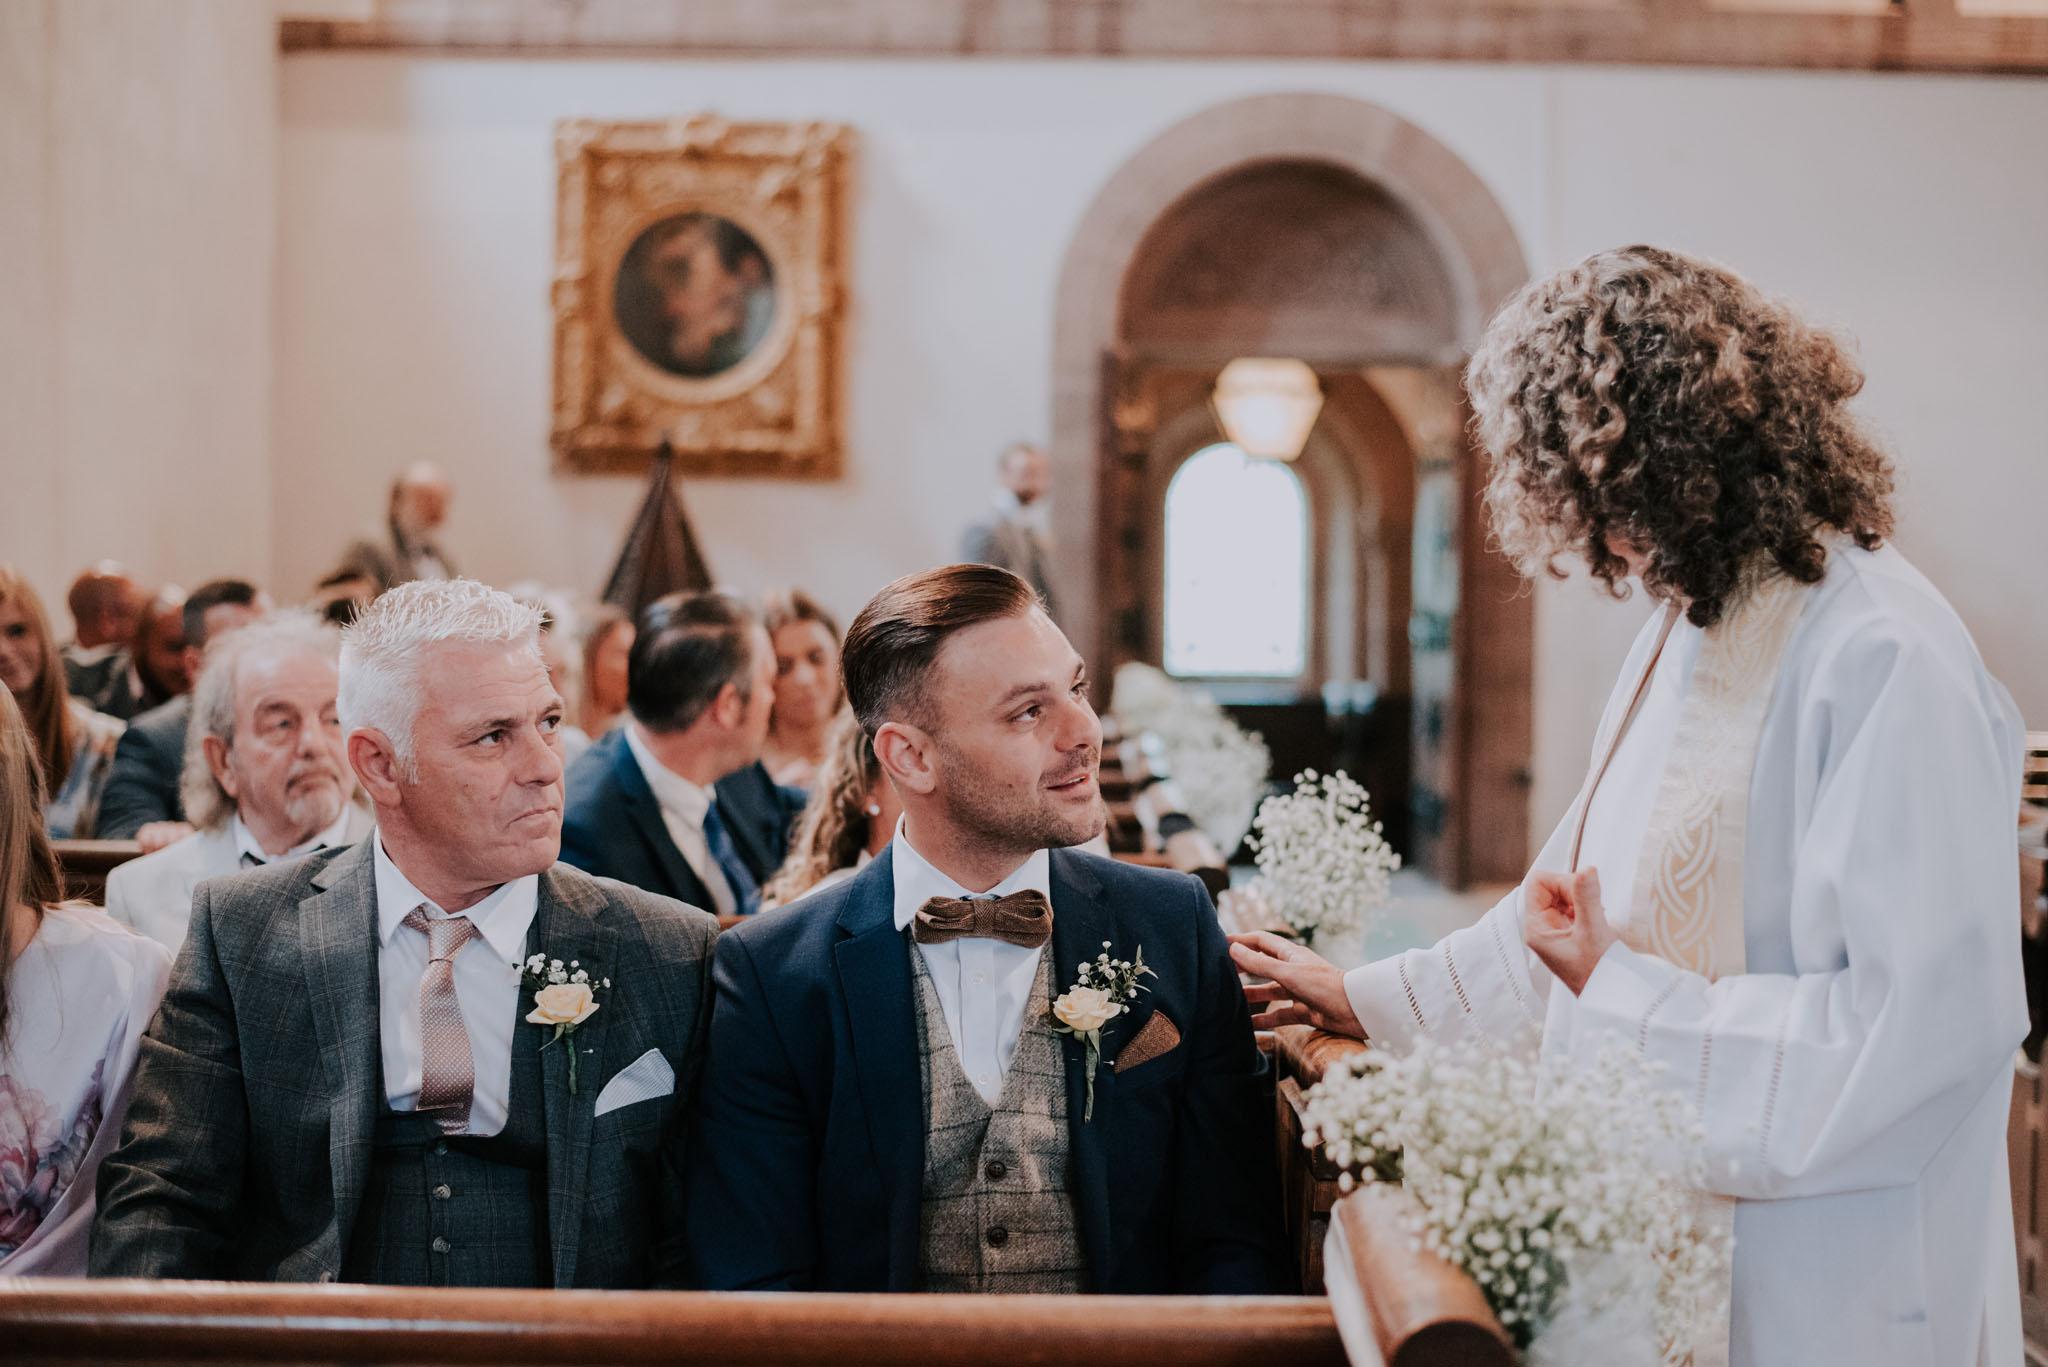 wedding-photographer-glewstone-court-hereford-scott-stockwell-photography154.jpg